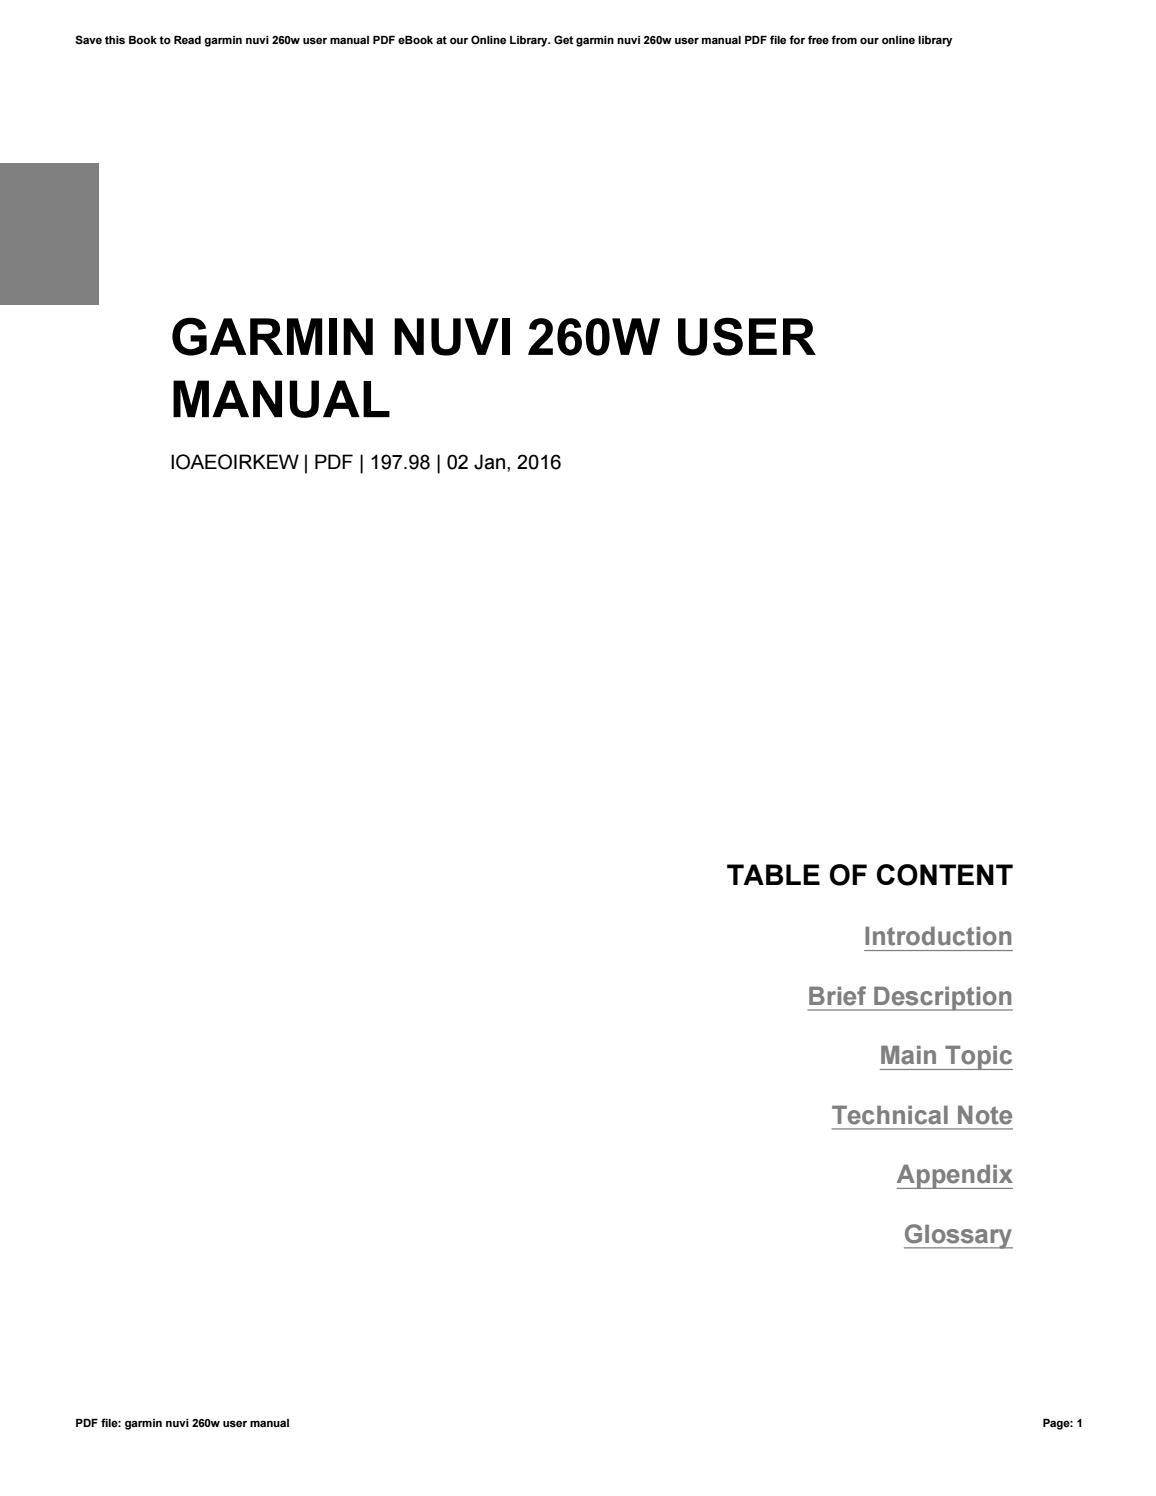 Garmin nuvi 260w instruction manual.